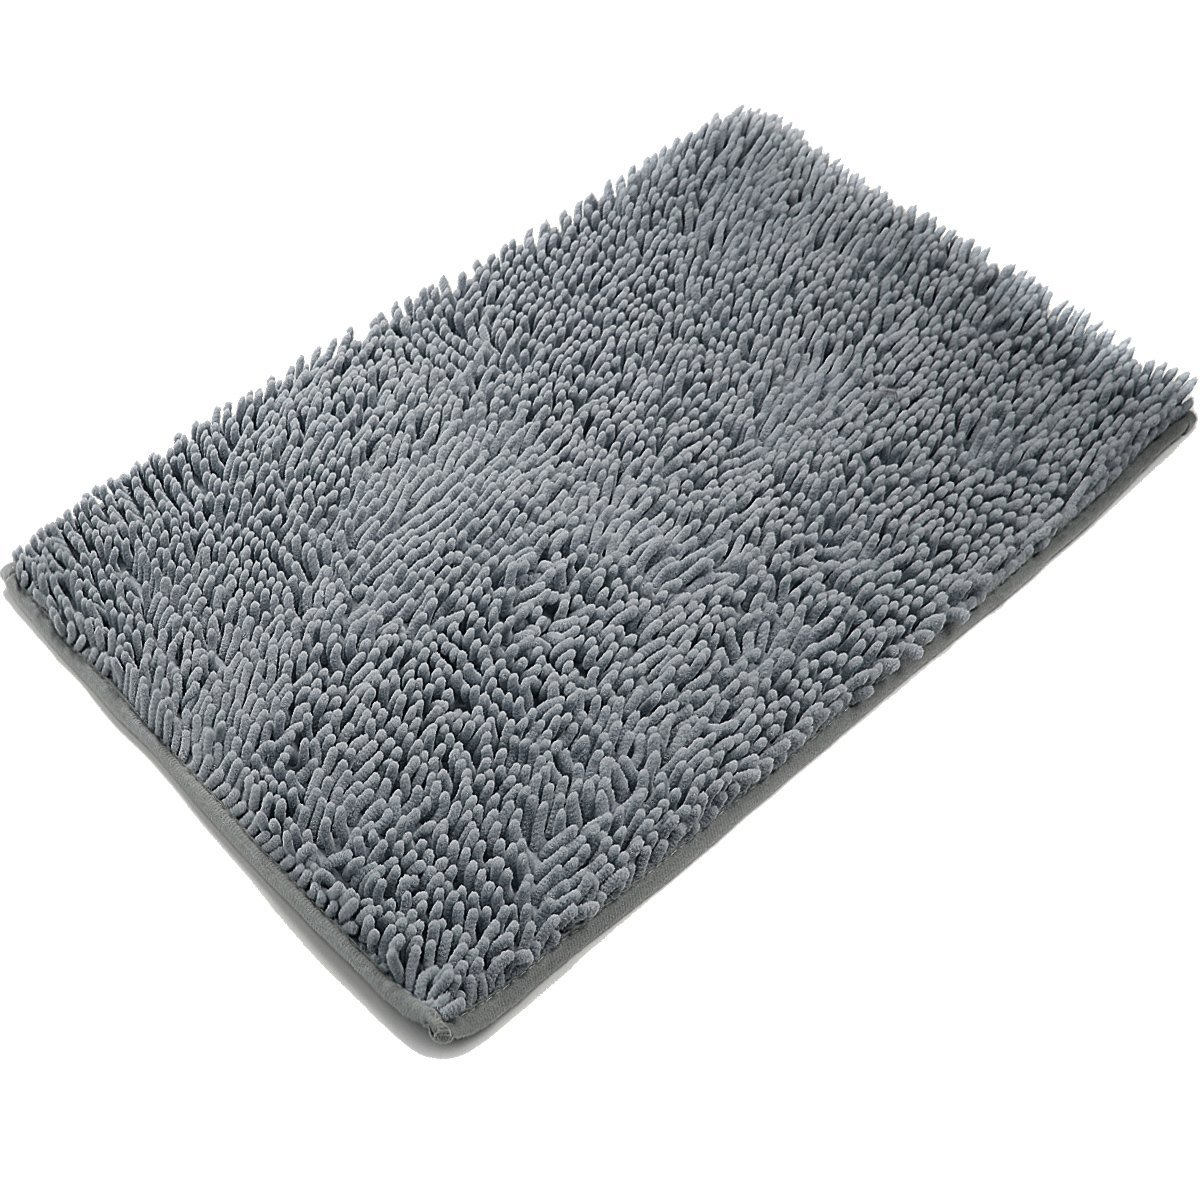 bath rugs amazon.com: vdomus non-slip microfiber shag bathroom mat, 20 x 32-inches,  dark gray: DNNGMNI